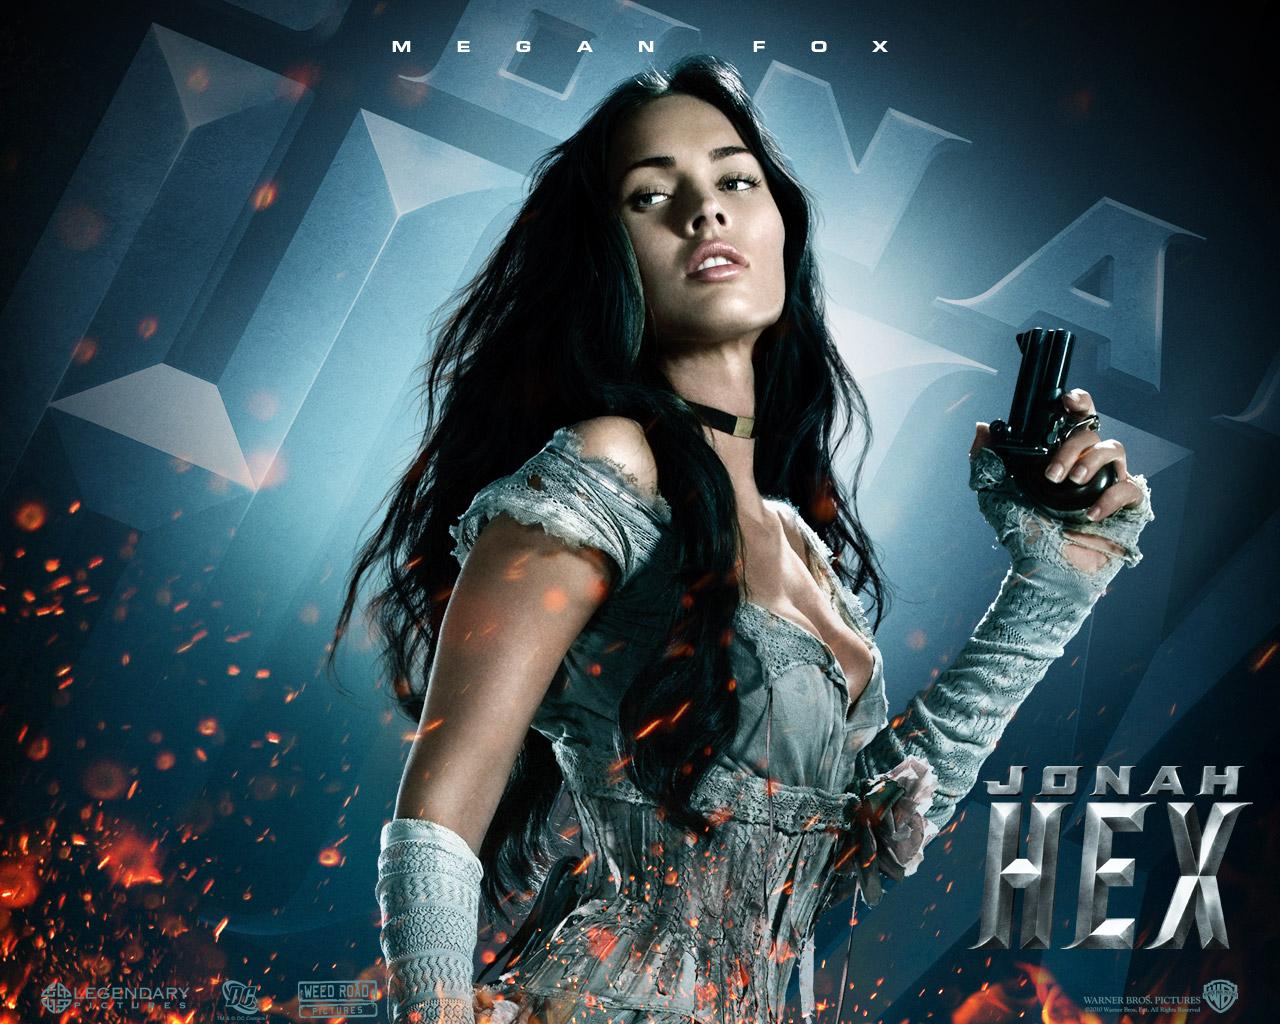 jonah hex hd movie download